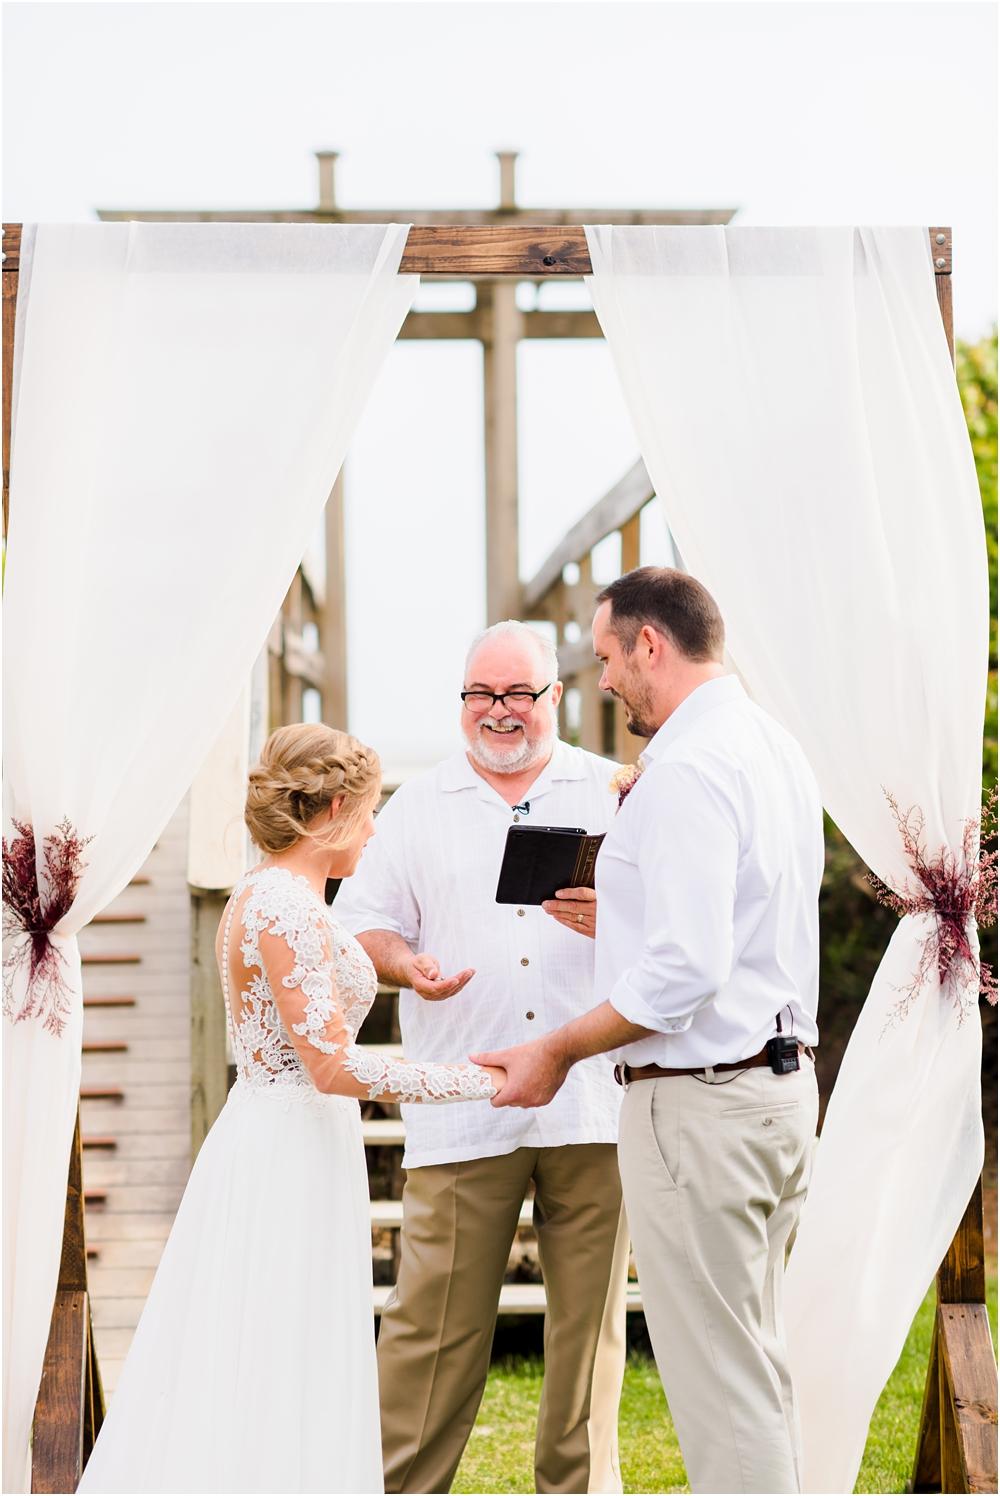 carrillo-triple-crown-santa-rosa-beach-florida-wedding-kiersten-stevenson-photography159.JPG